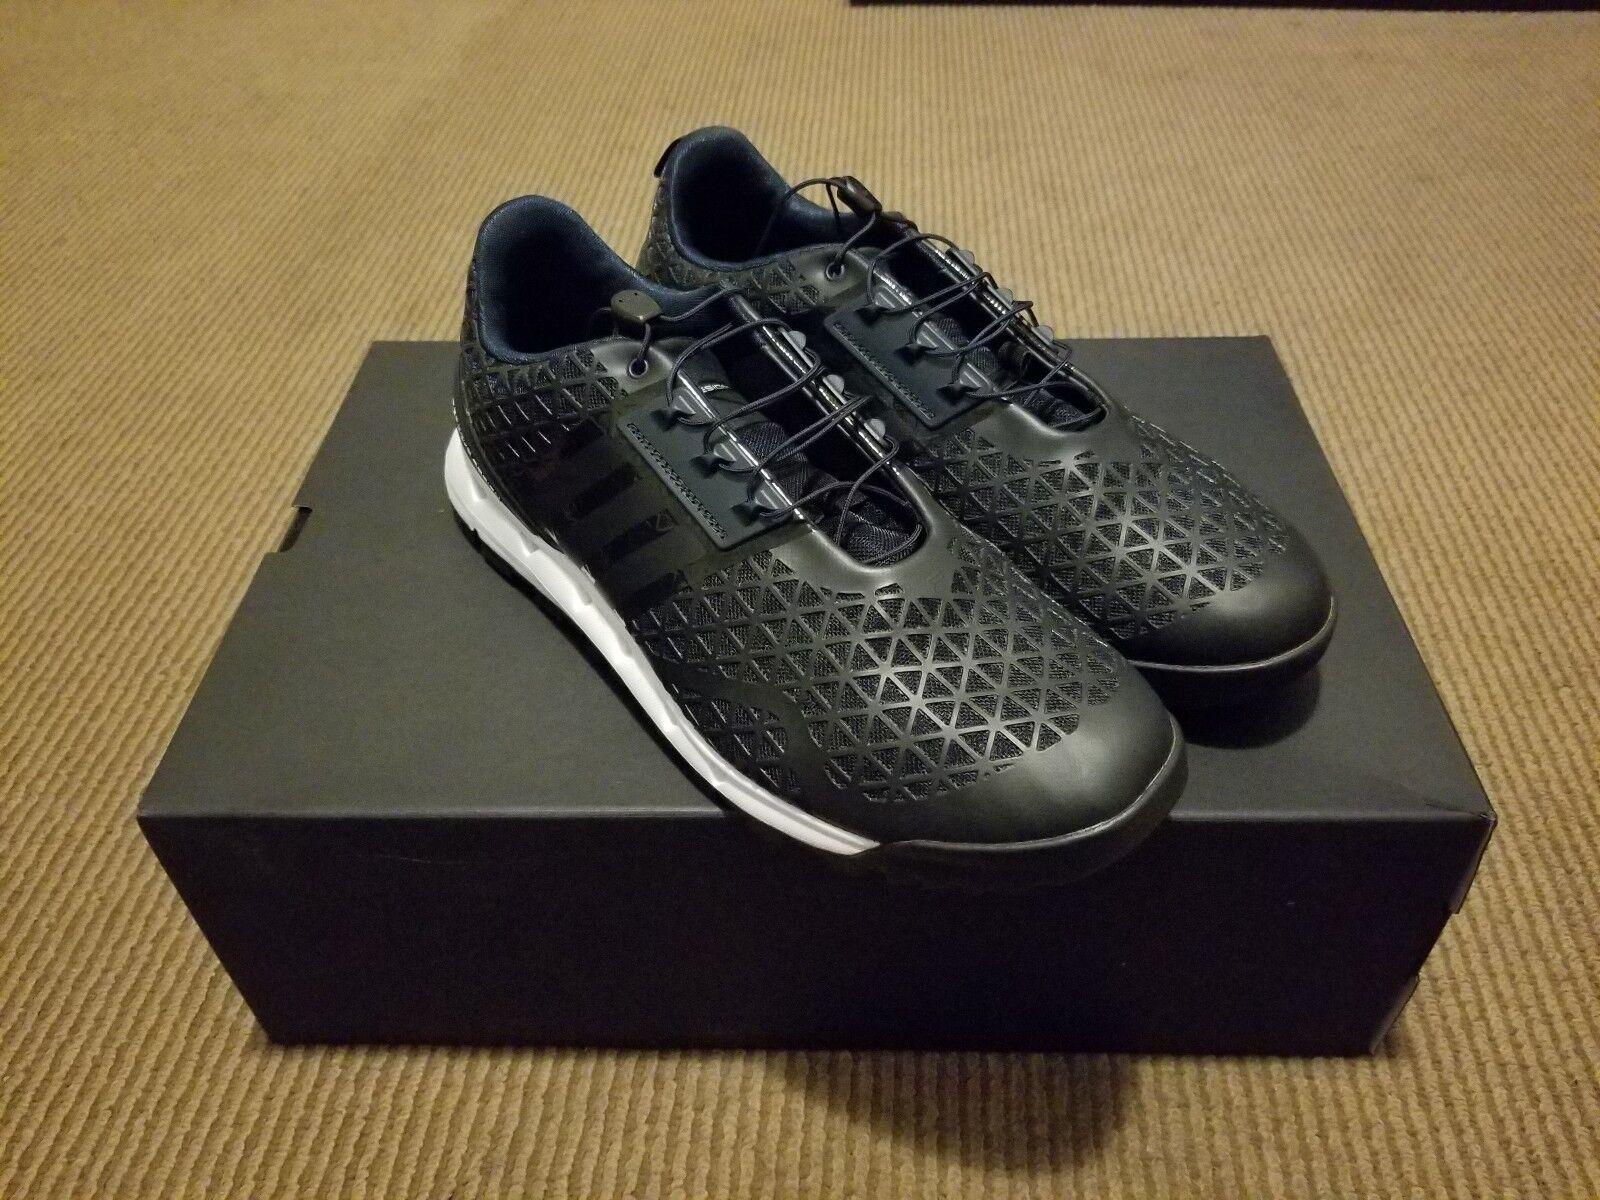 Adidas porsche design sport p - 2 5000 10 1 / 2 - 652126